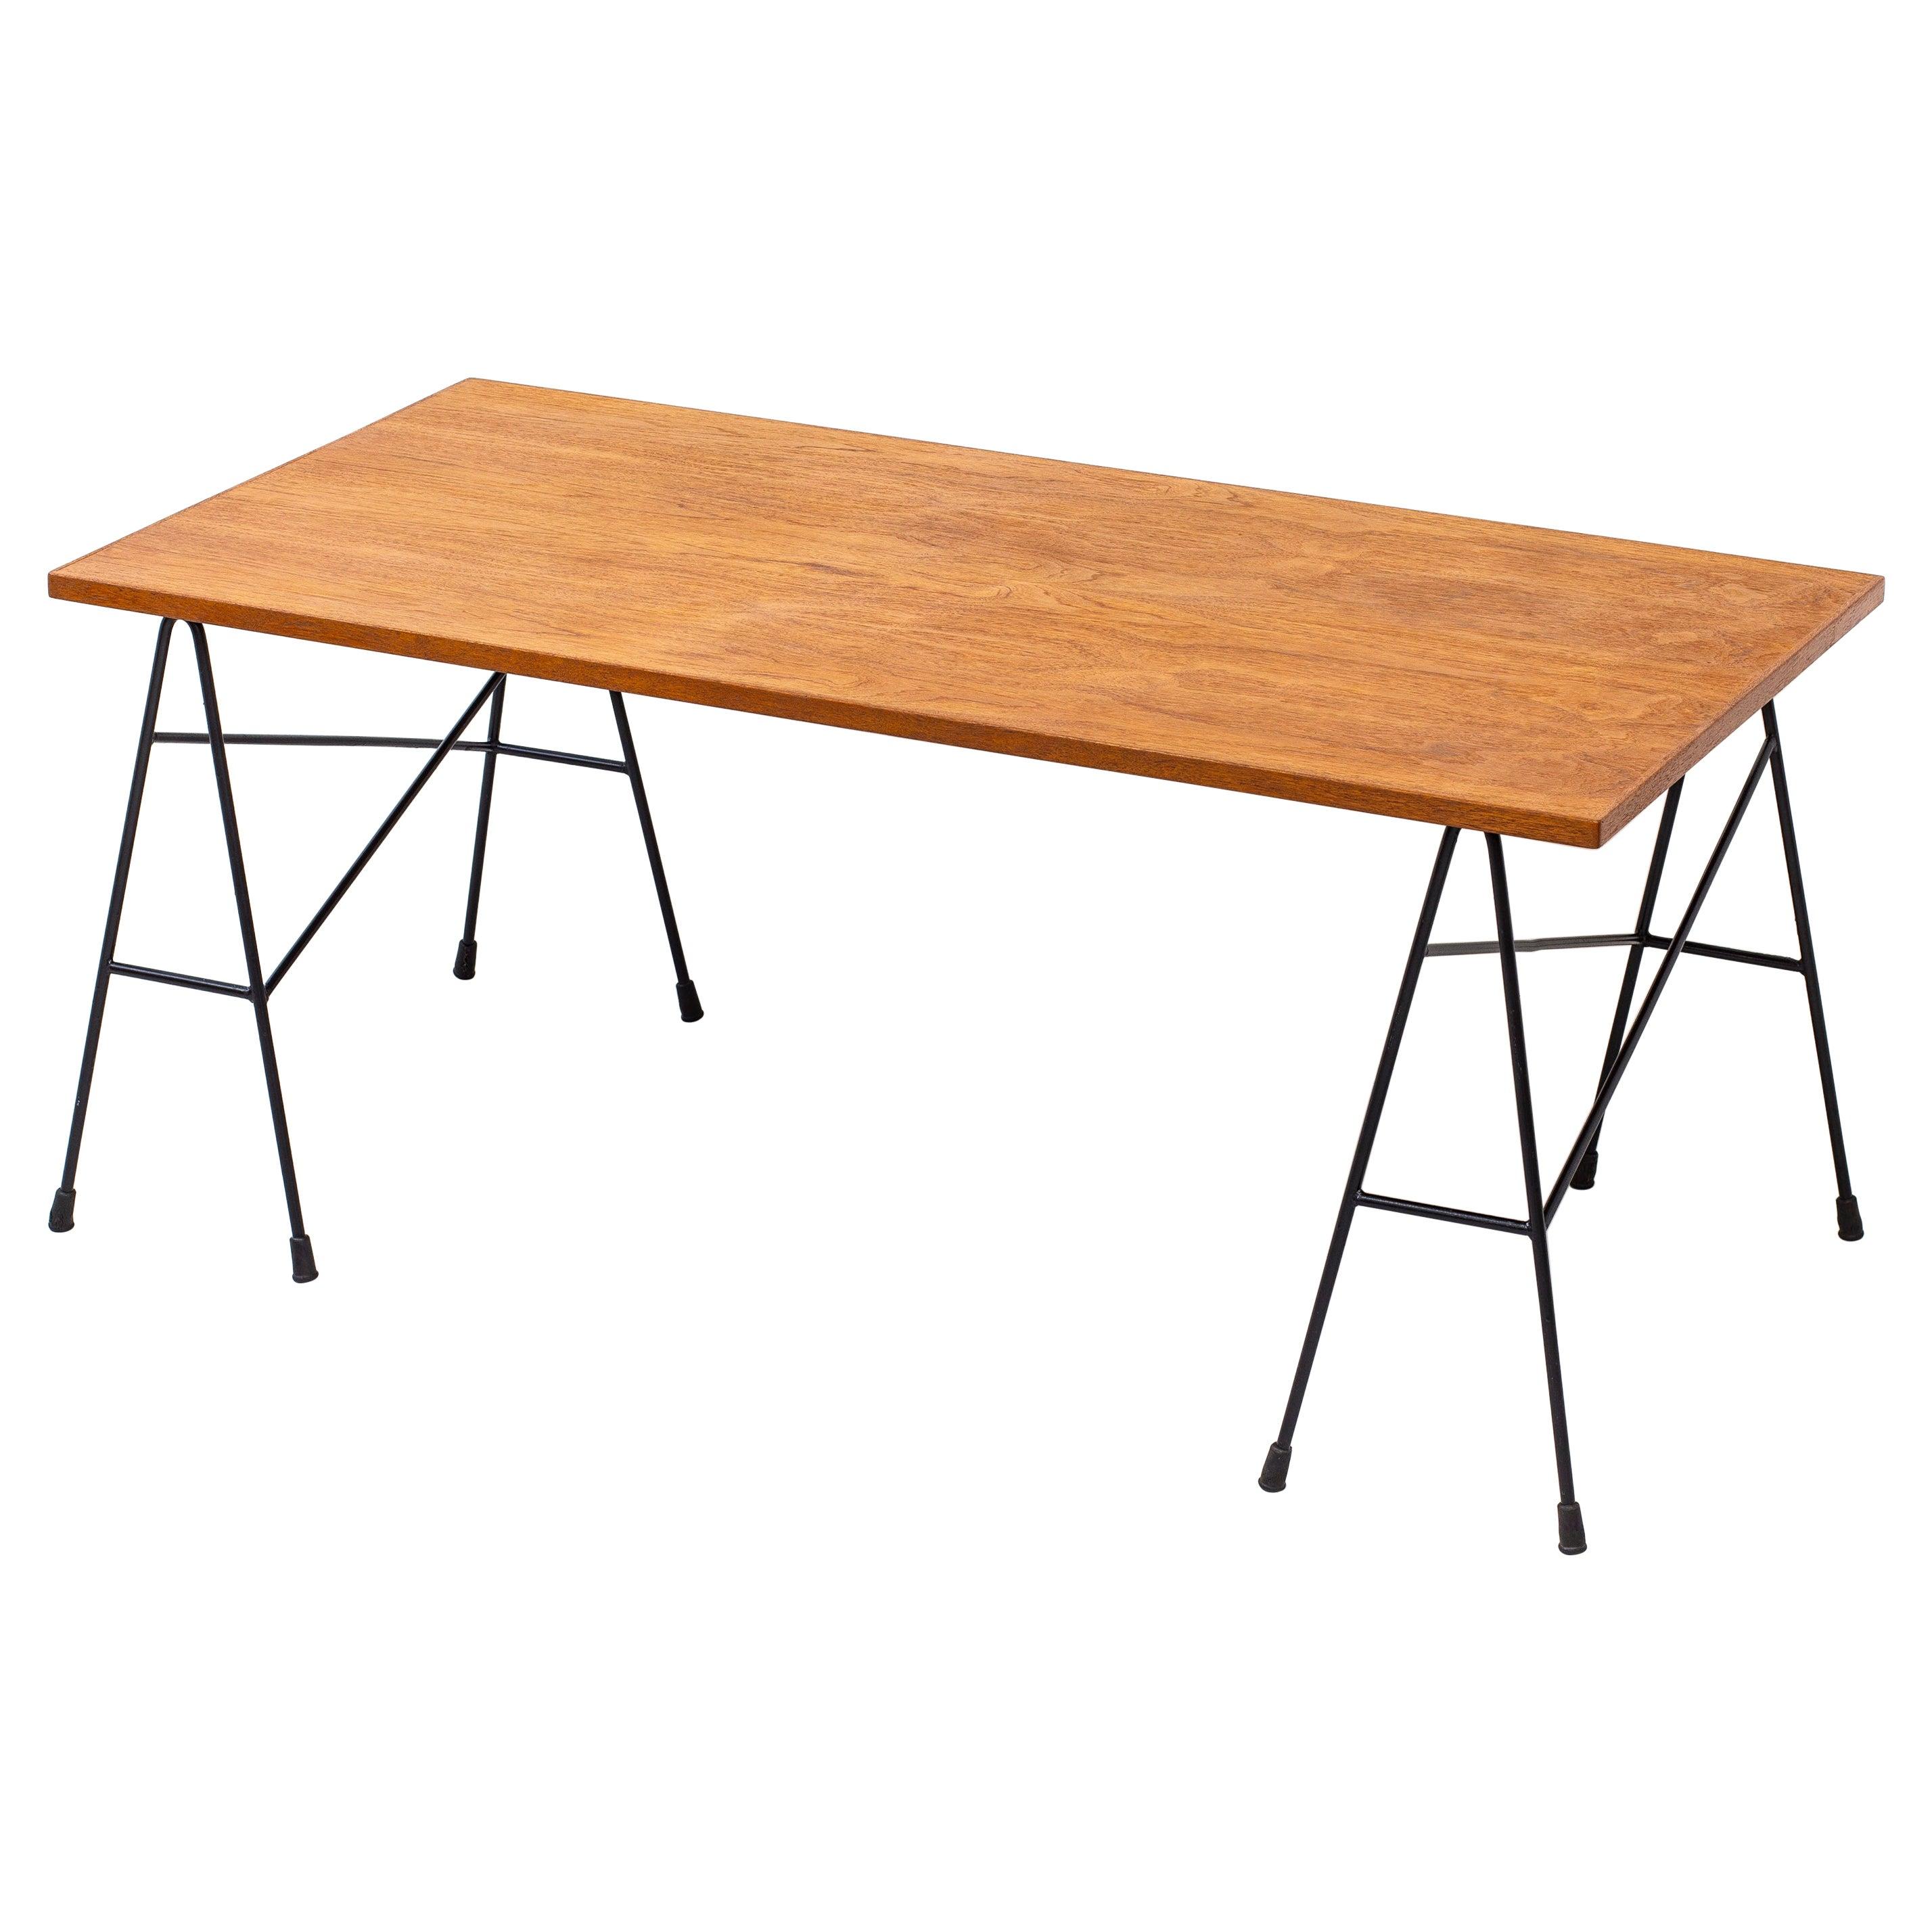 Desk /Table by Bengt Johan Gullberg, Metal and Teak, Sweden, 1950s